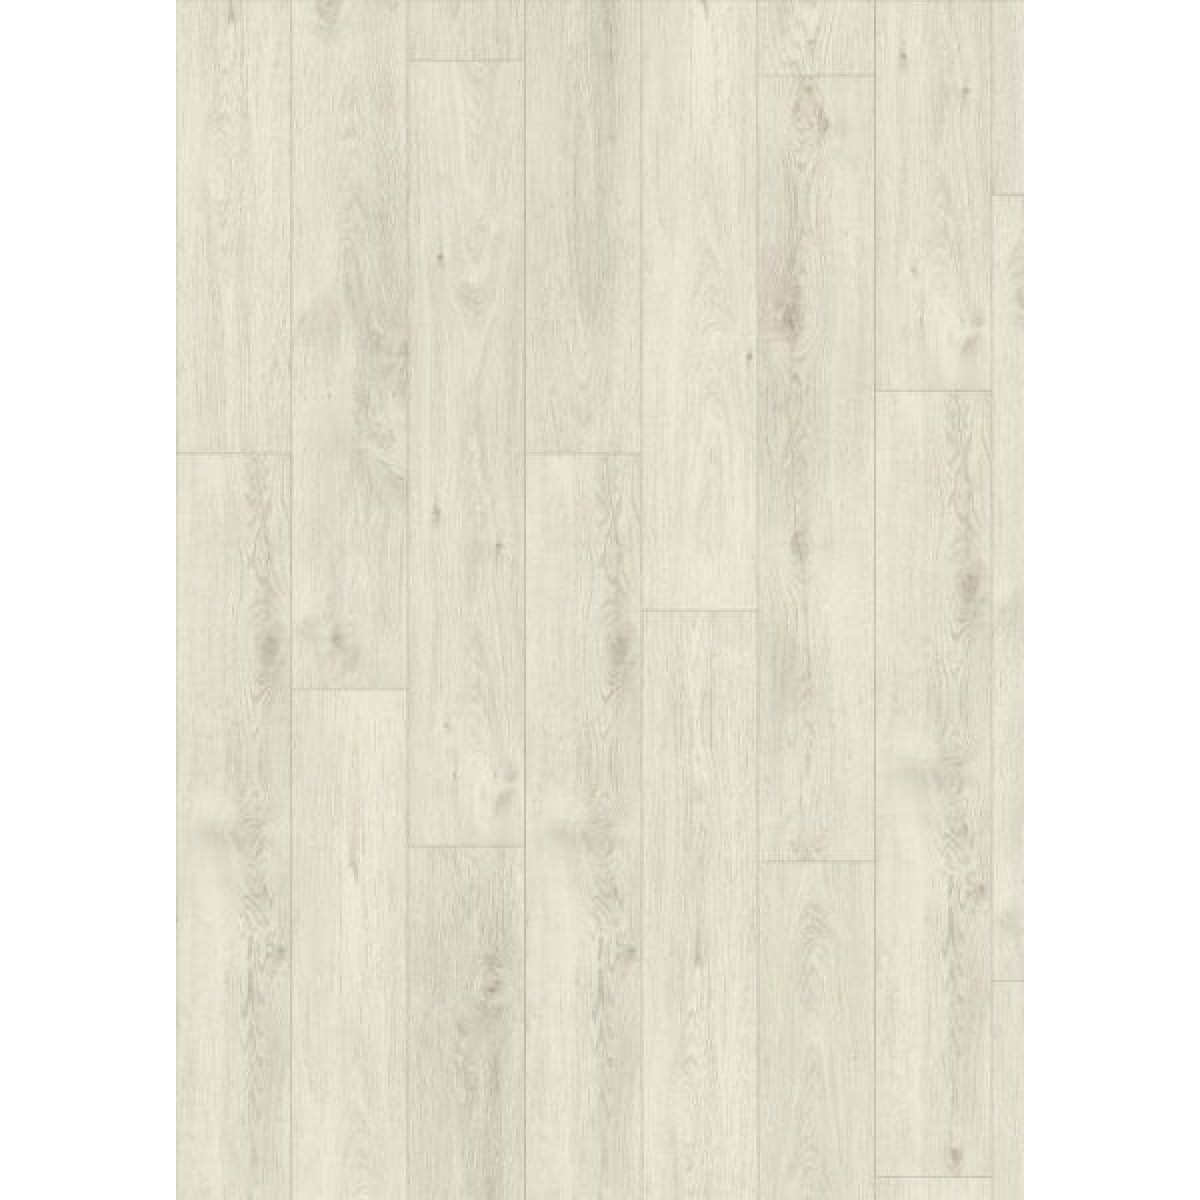 egger cortina oak white 4v laminate flooring per pack. Black Bedroom Furniture Sets. Home Design Ideas